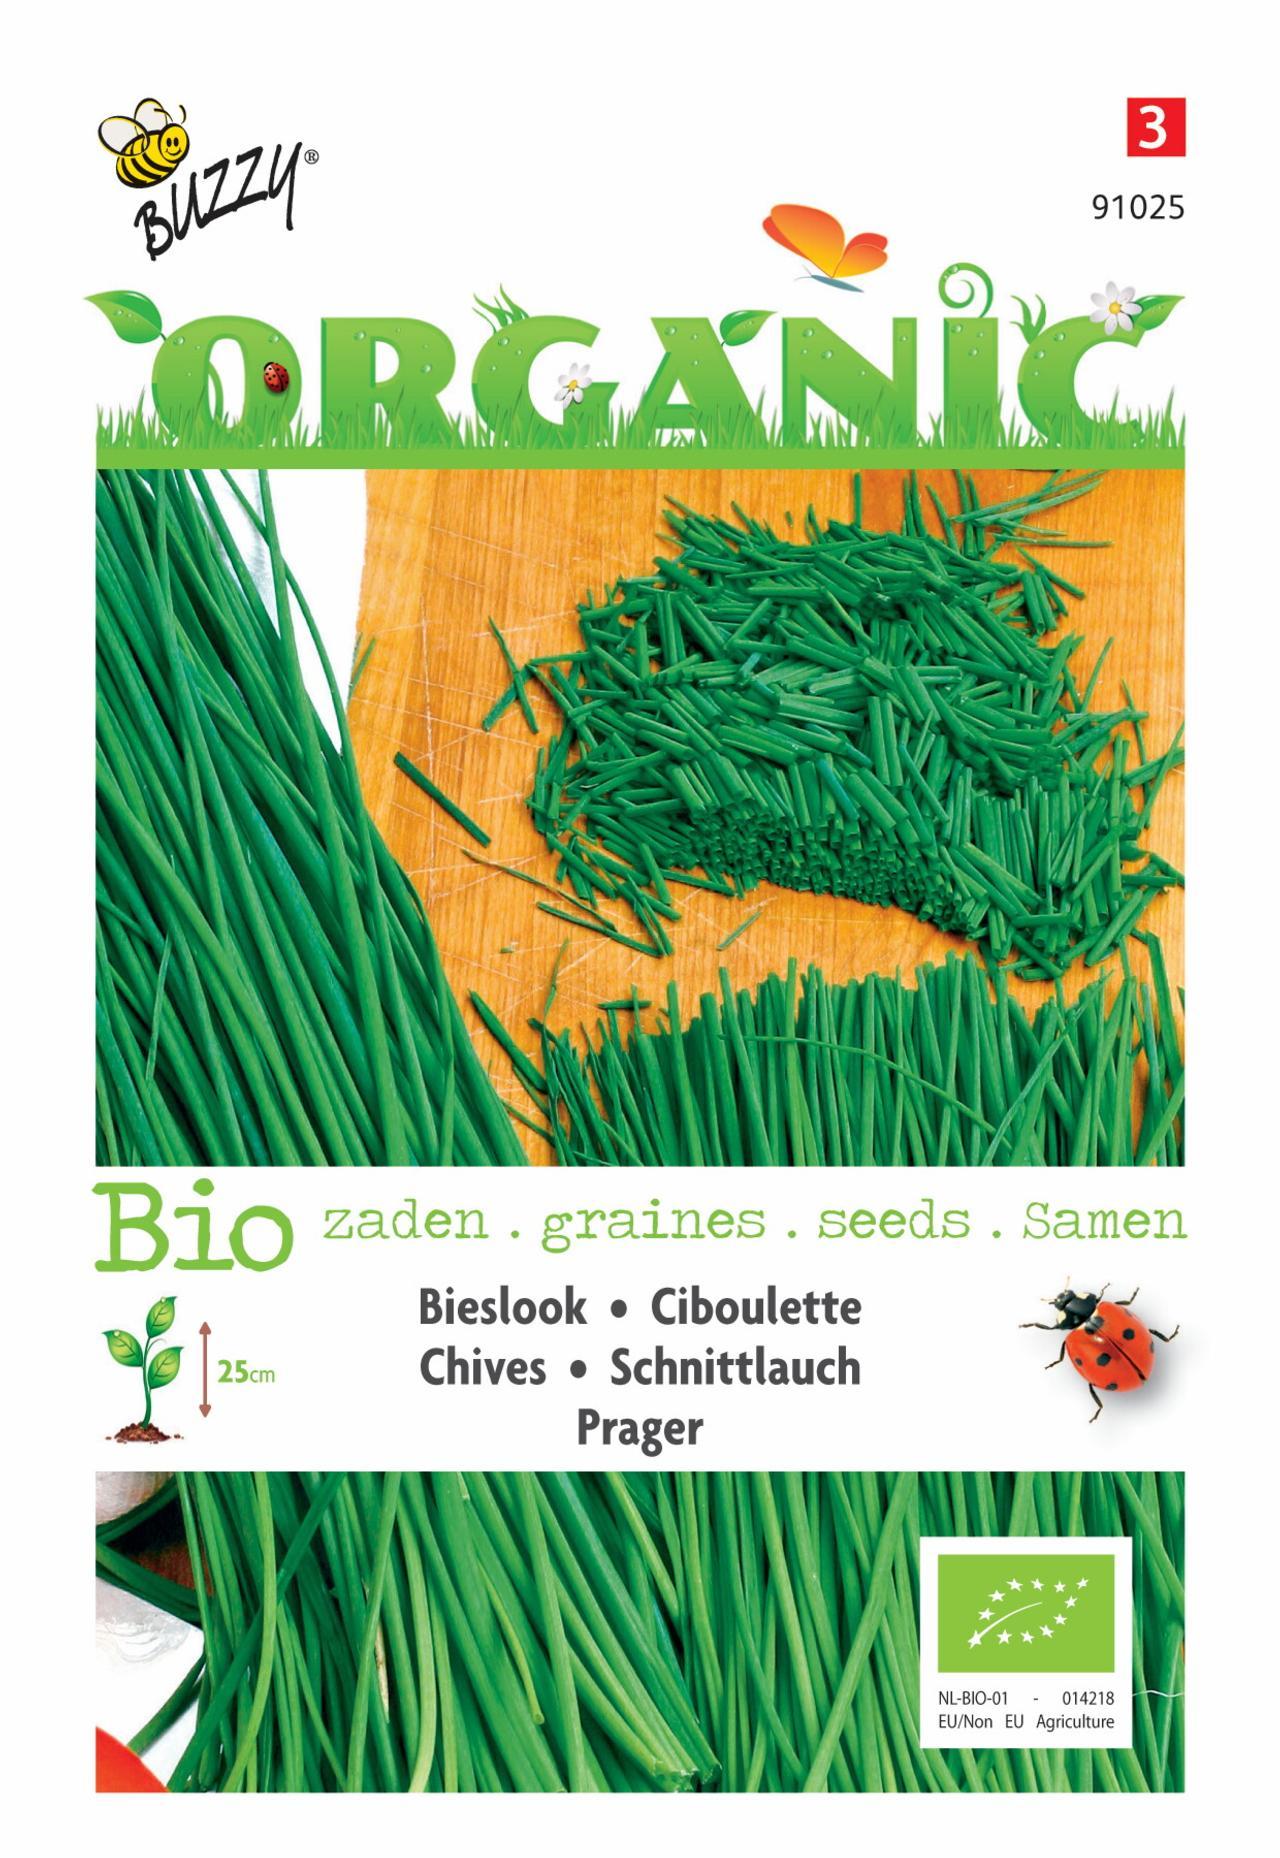 Allium schoenoprasum 'Prager' (BIO) plant